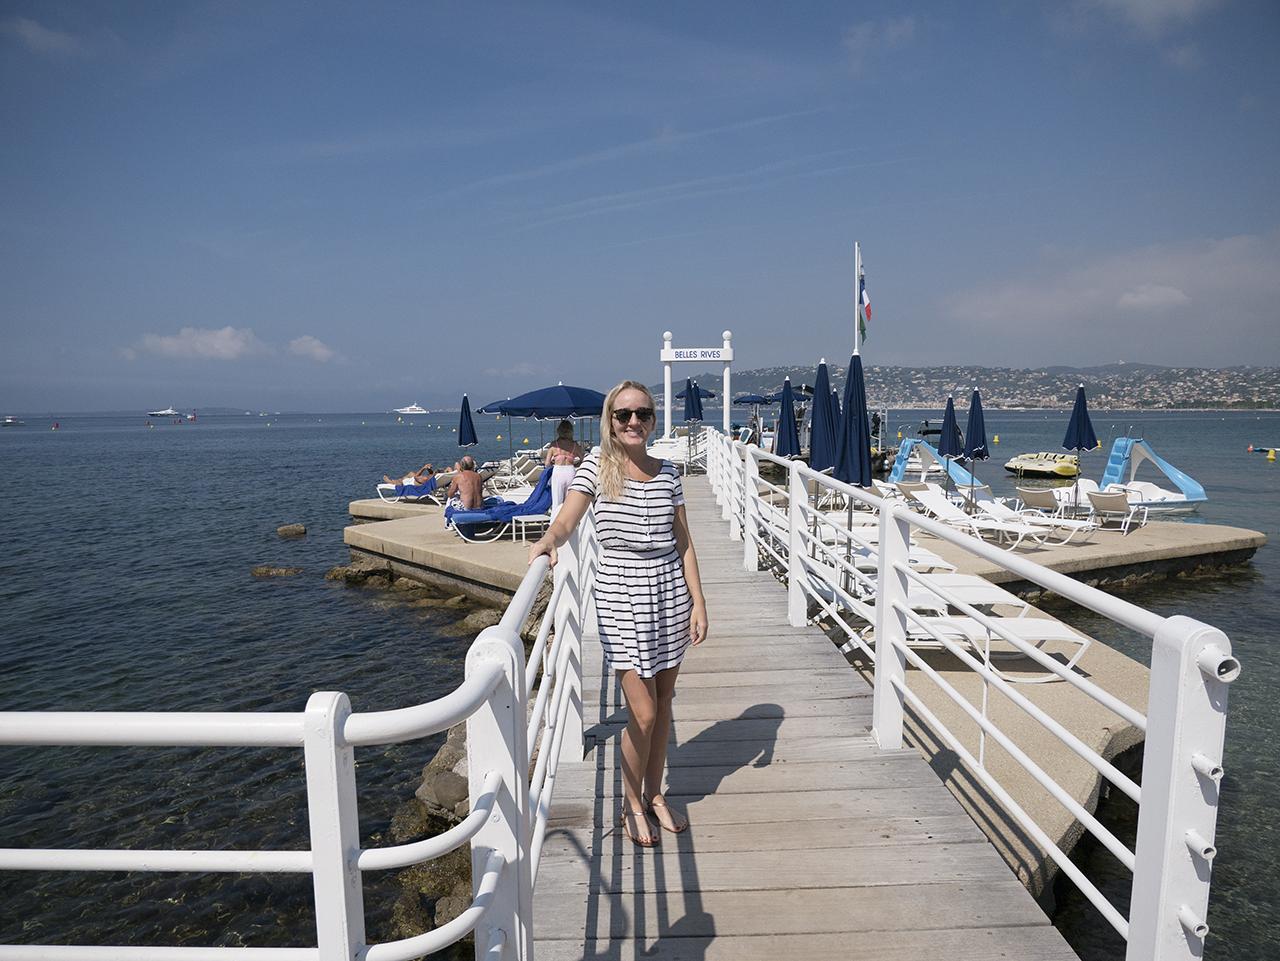 Hotel Belle Rives Review, Juan Les Pins, Cap d'Antibes